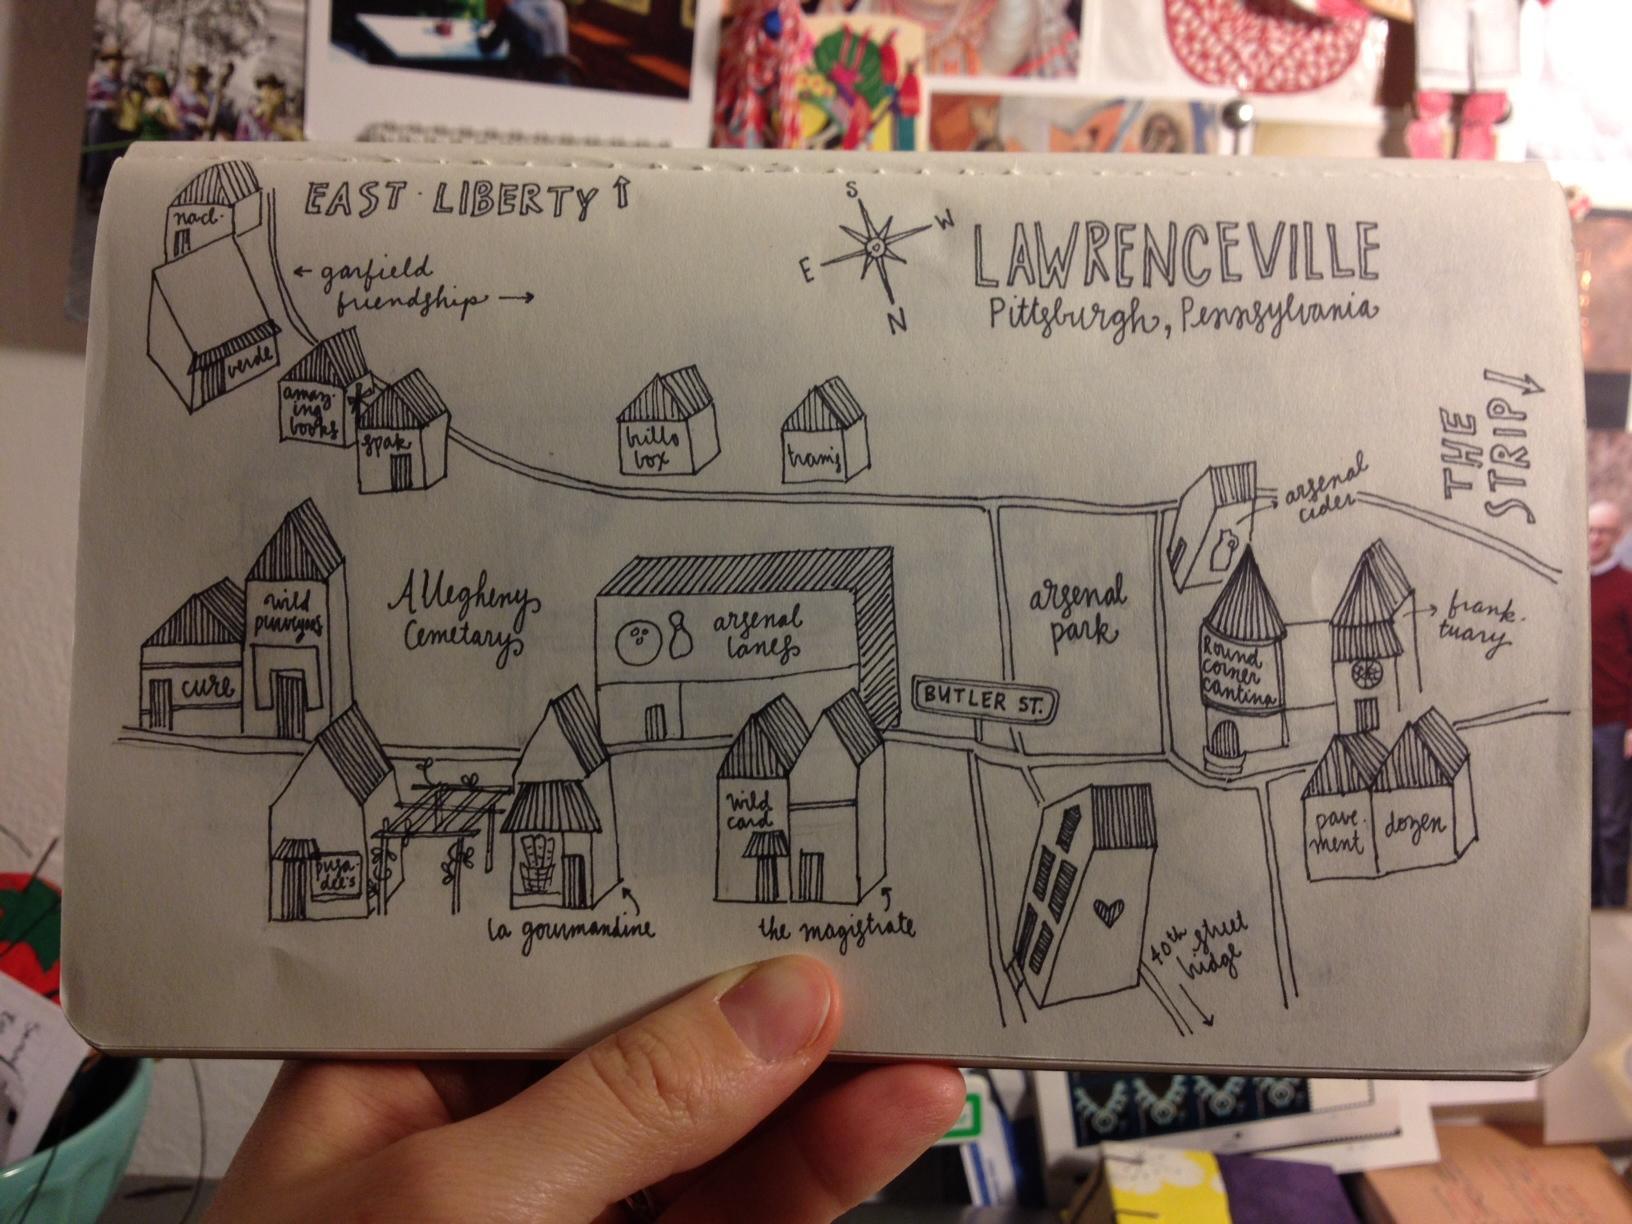 pittsburgh // neighborhoods // drawings  - image 4 - student project